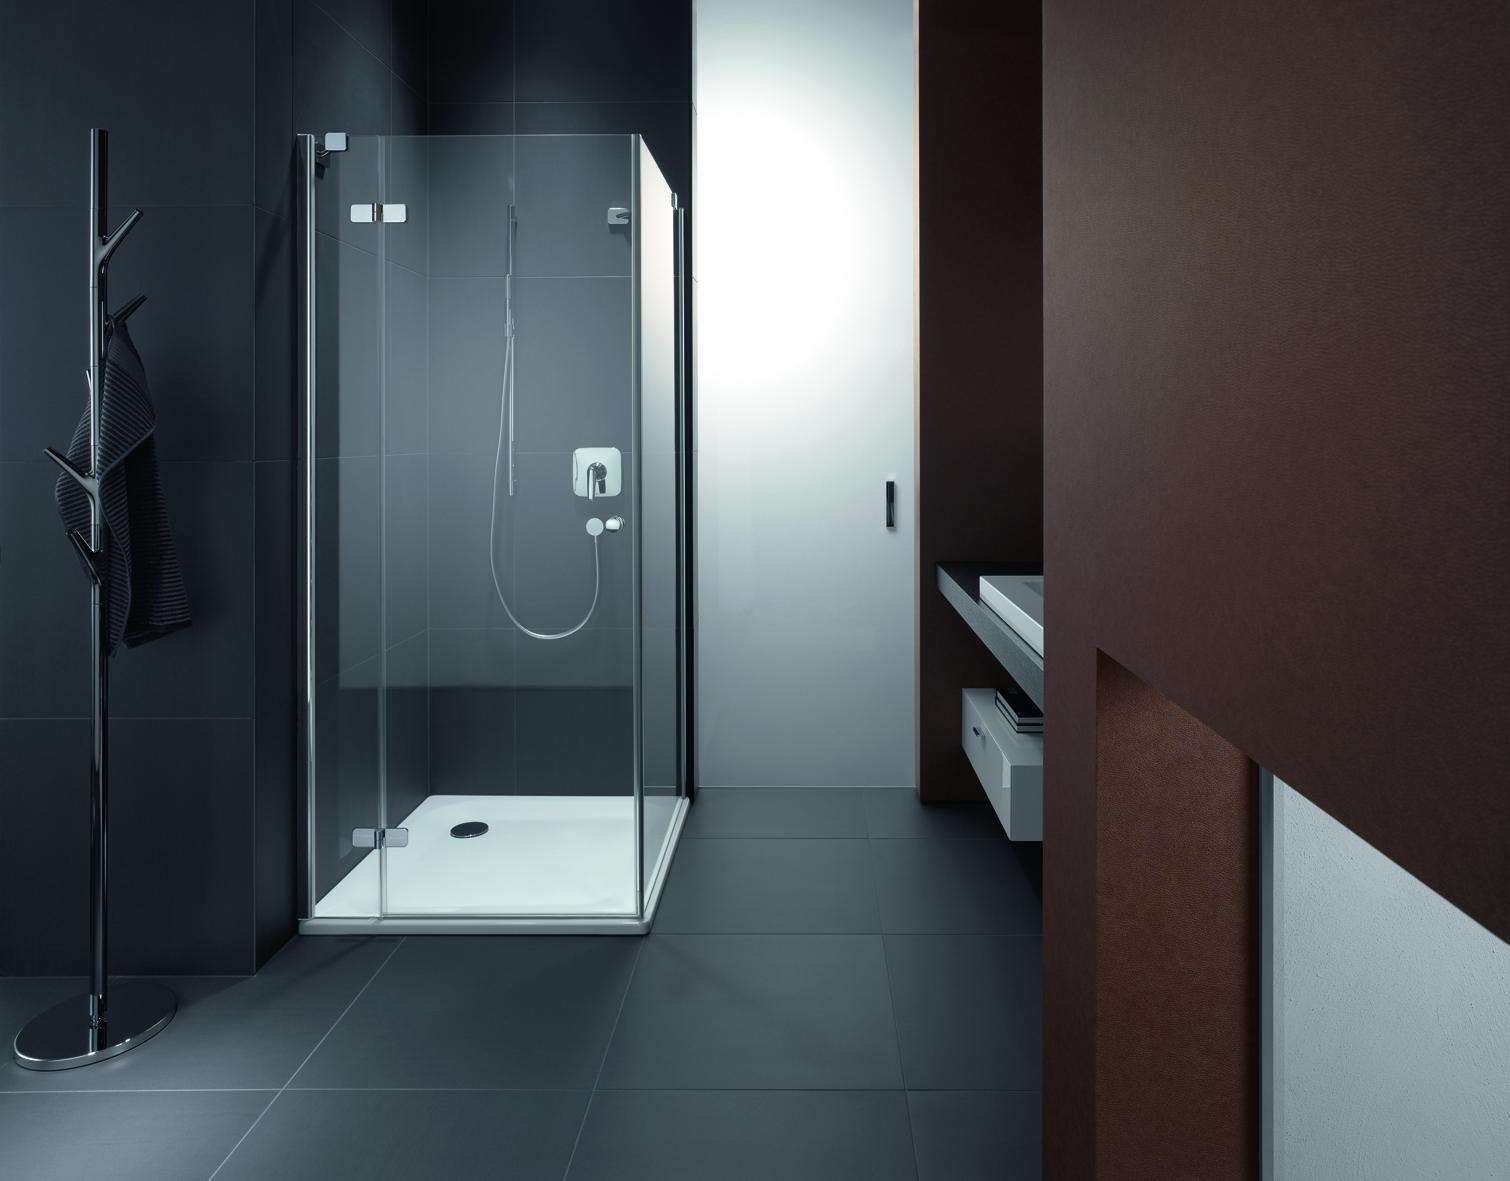 bette duschwanne superflach brausewanne kaldewei zirkon duschwanne superplan x bette. Black Bedroom Furniture Sets. Home Design Ideas